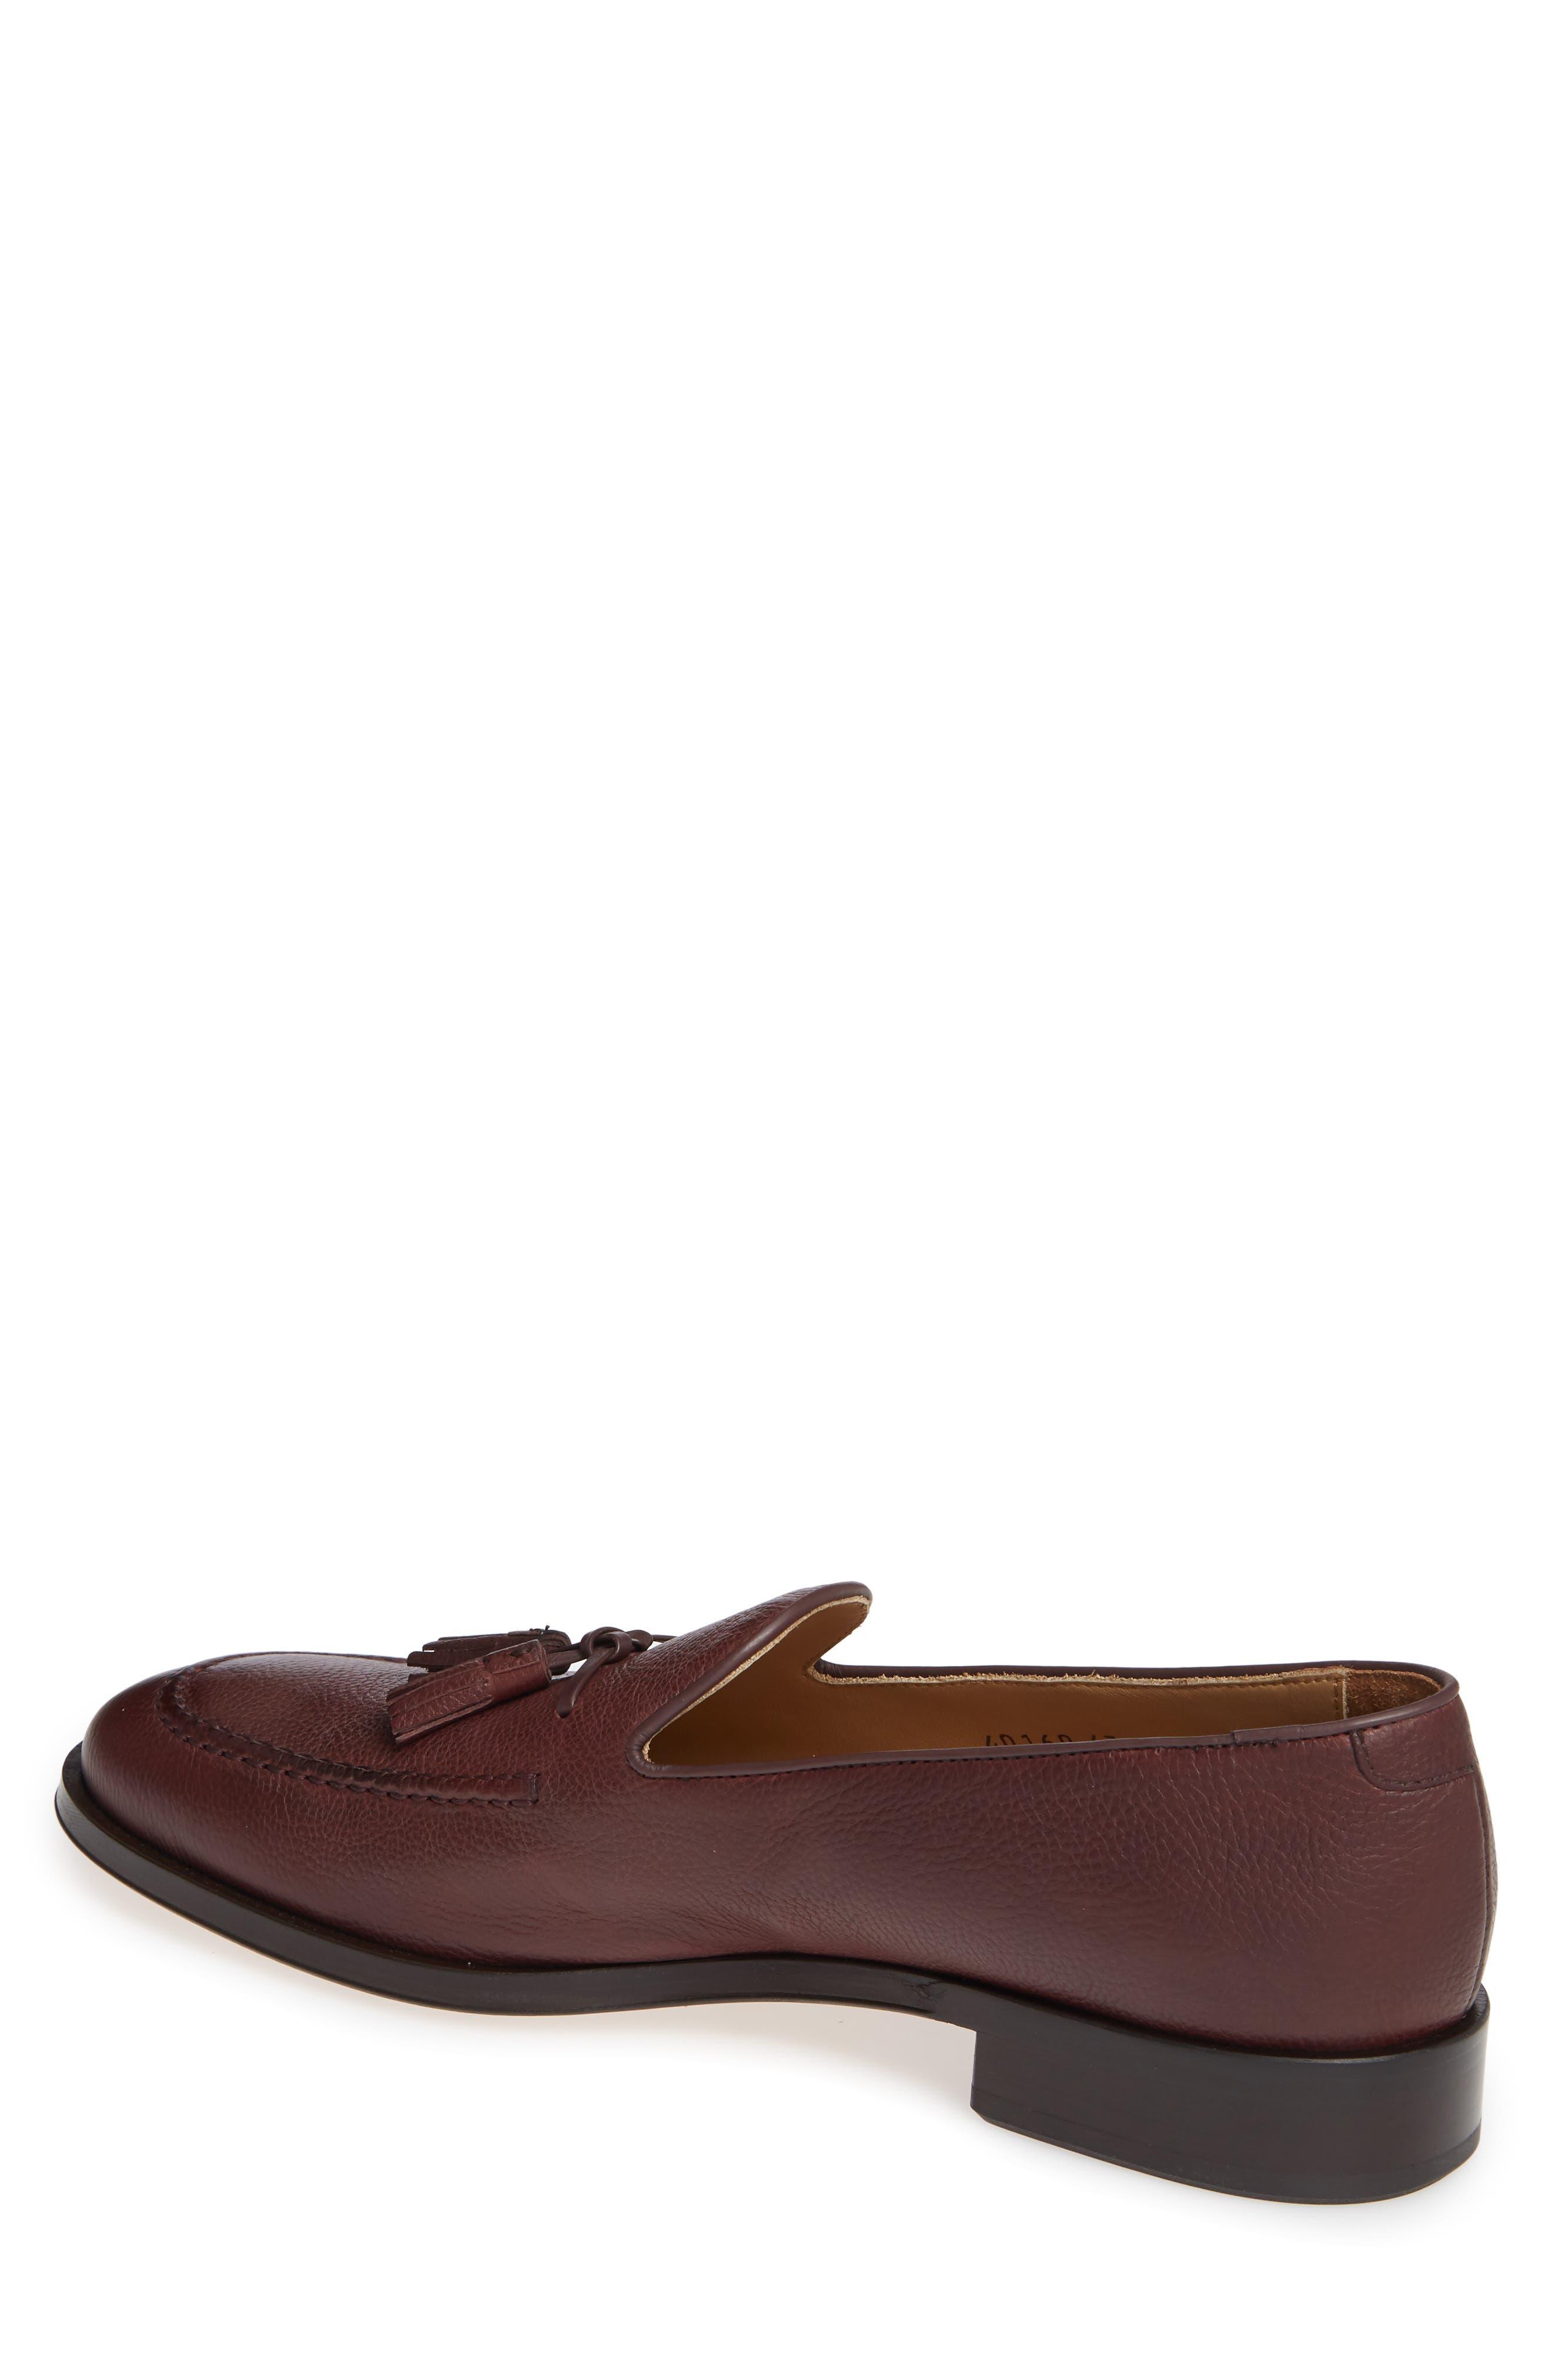 737f0f8a1cf Allen Edmonds Men s Loafers   Slip-Ons